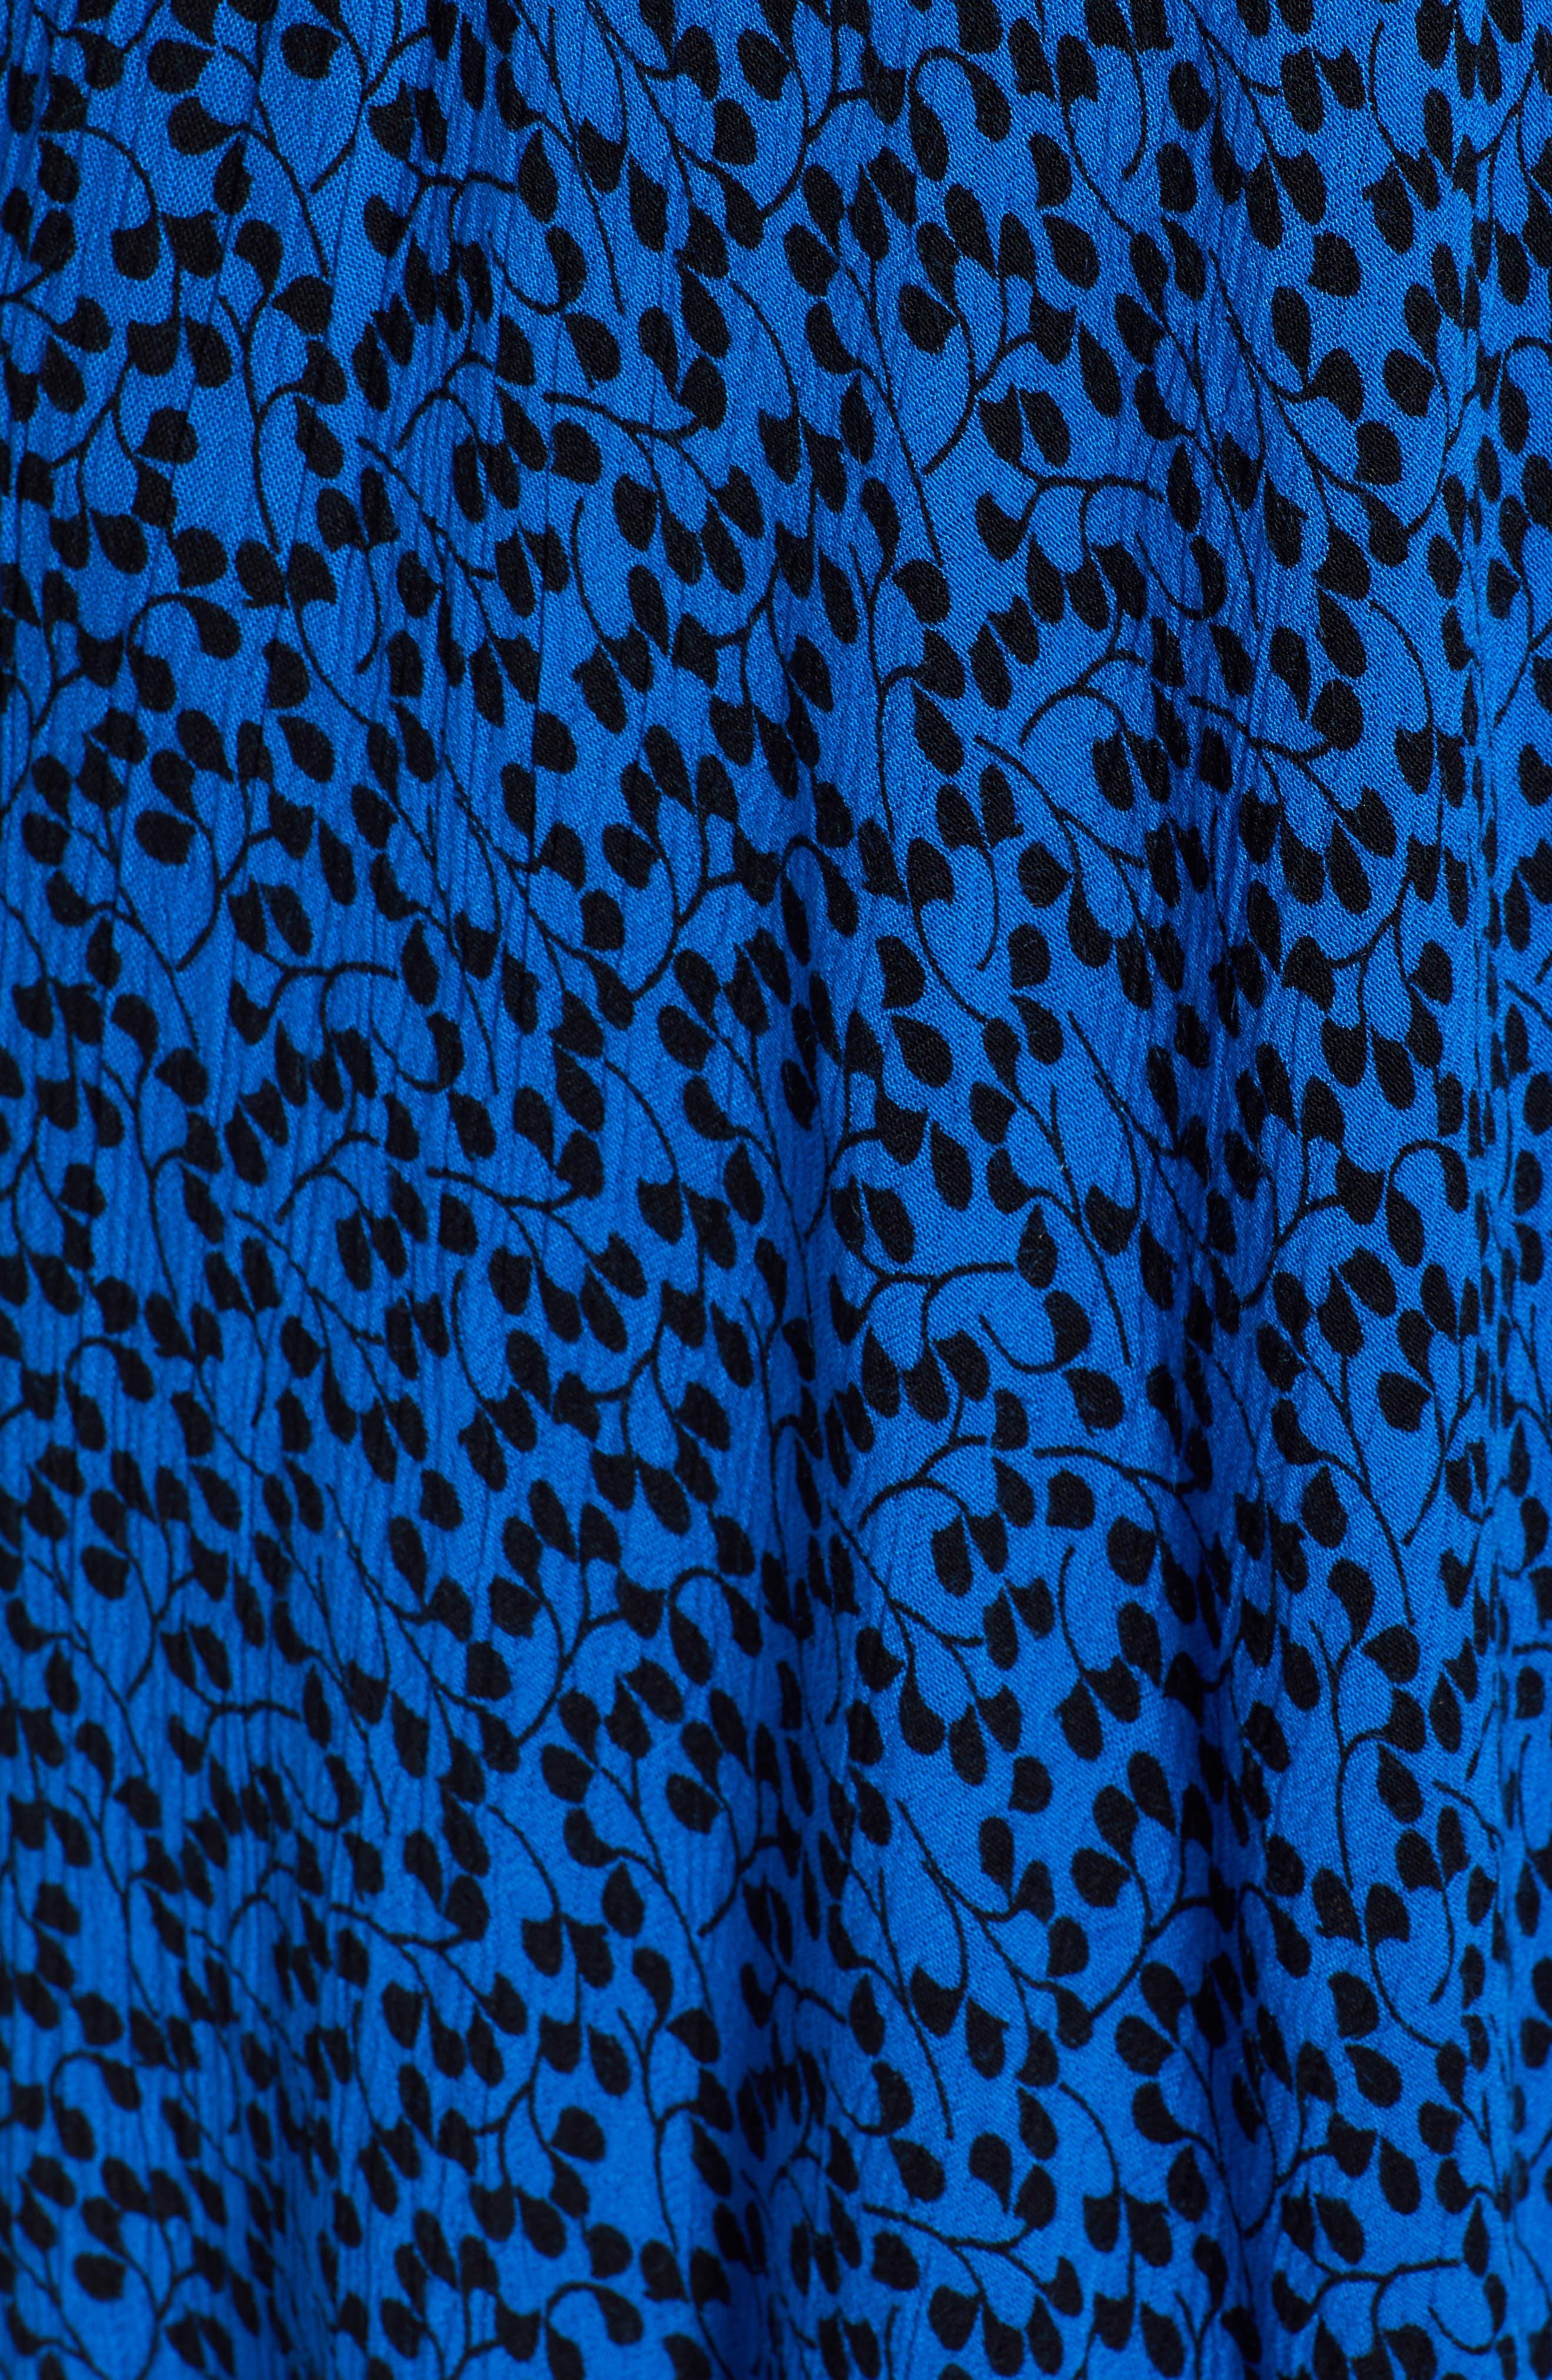 Bali Off The Shoulder Maxi Dress,                             Alternate thumbnail 6, color,                             ROYAL/ BLACK